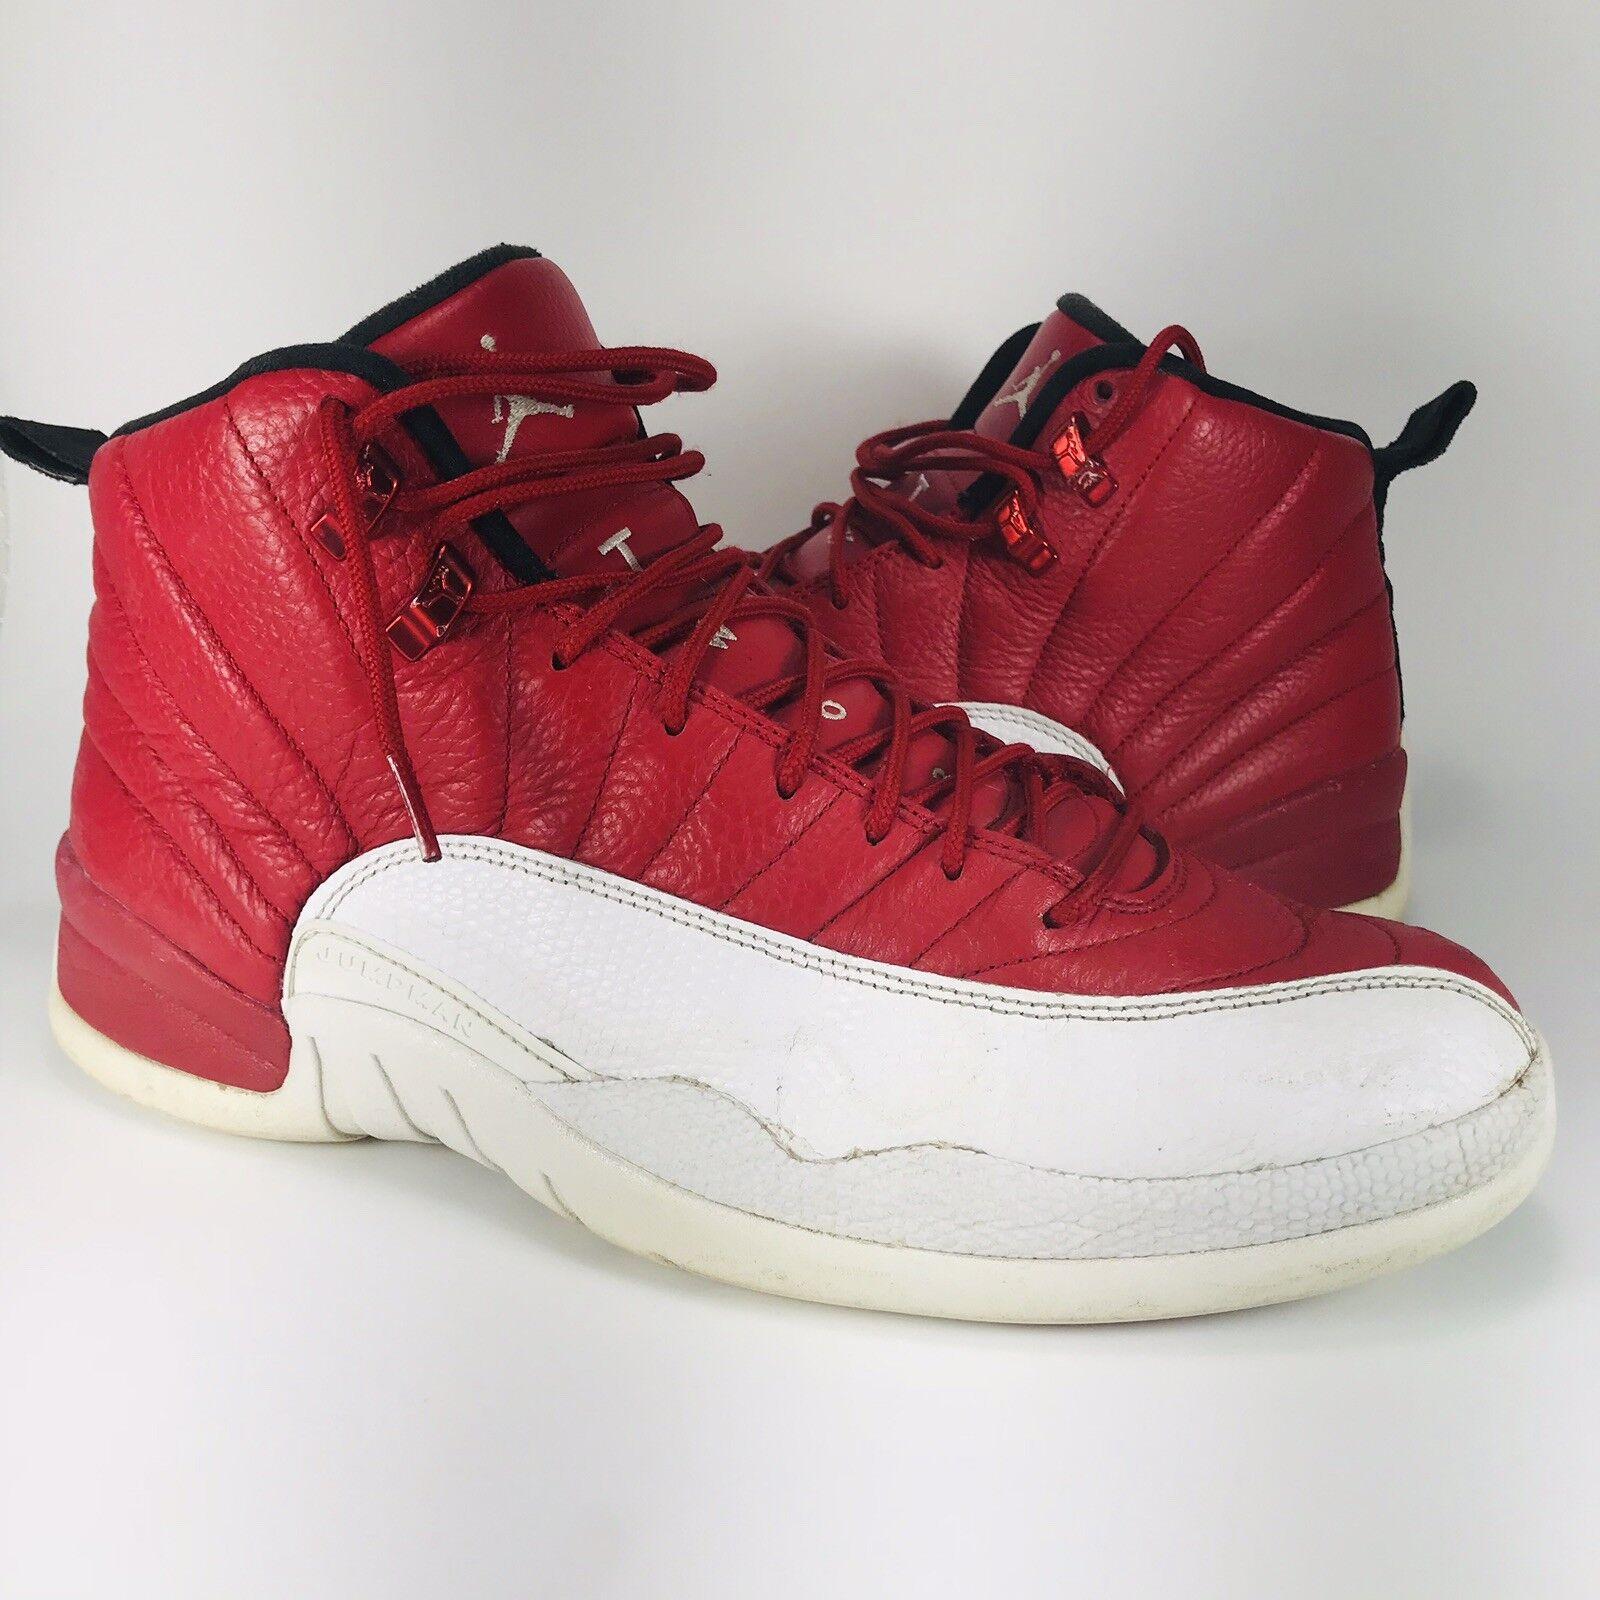 Jordan 12 XII Retro Air Gym Rojo blancoo 130690-600 baloncesto alternativo